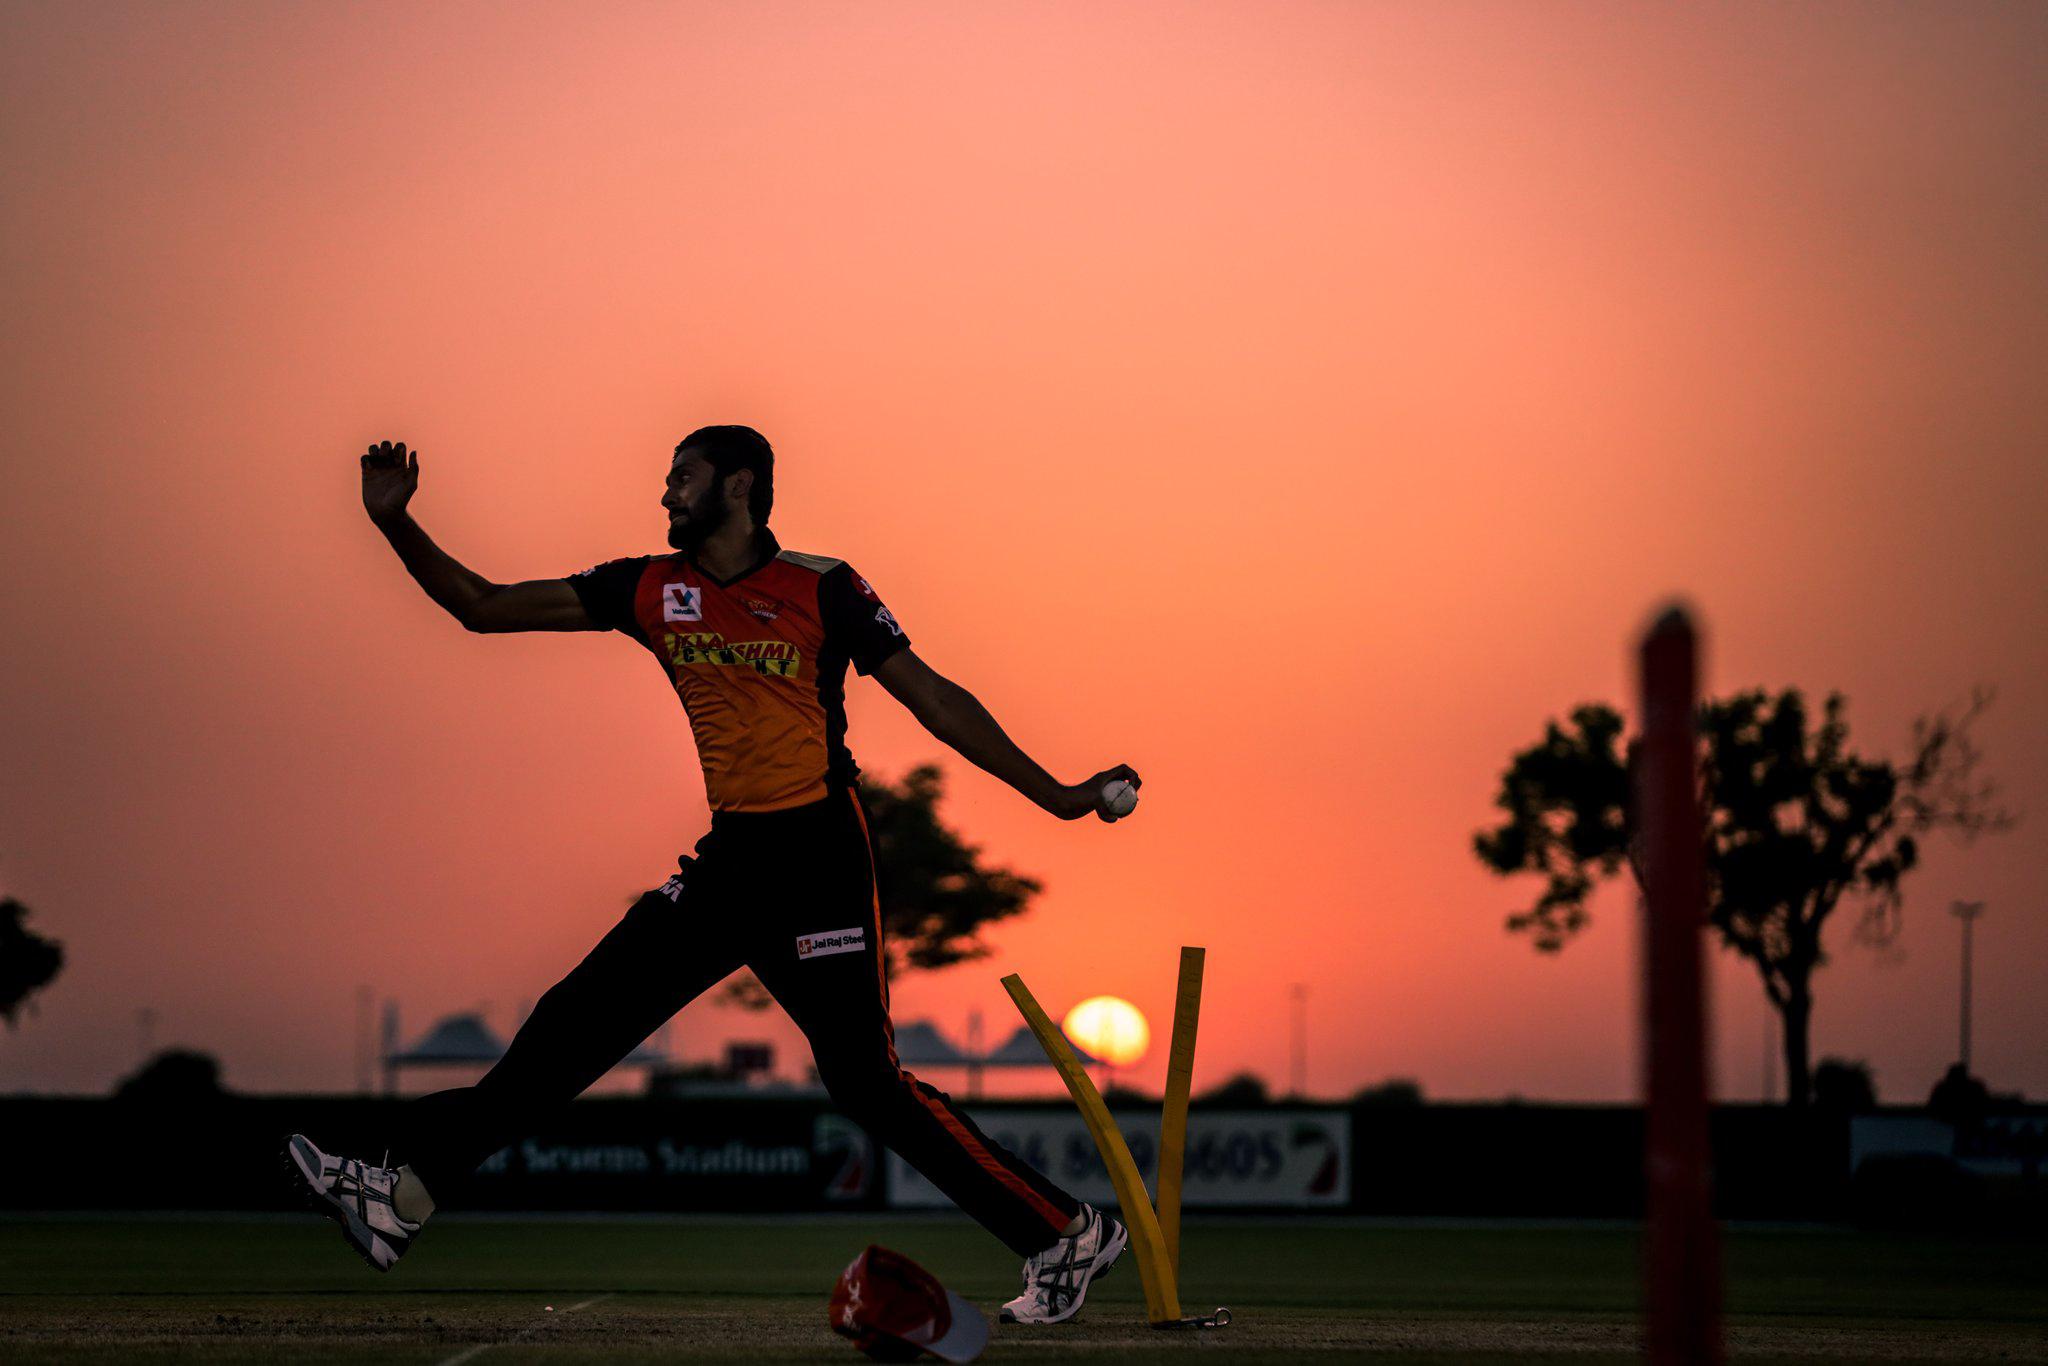 IPL-2020-Images-Sunrisers-Hyderabad-Vs-Royal-Challengers-Bangalore-Match-Photos, ఐపీఎల్ 2020: సన్ రైజర్స్ తో రాయల్ ఛాలెంజర్స్ ఢీ..(ఫోటోలు)